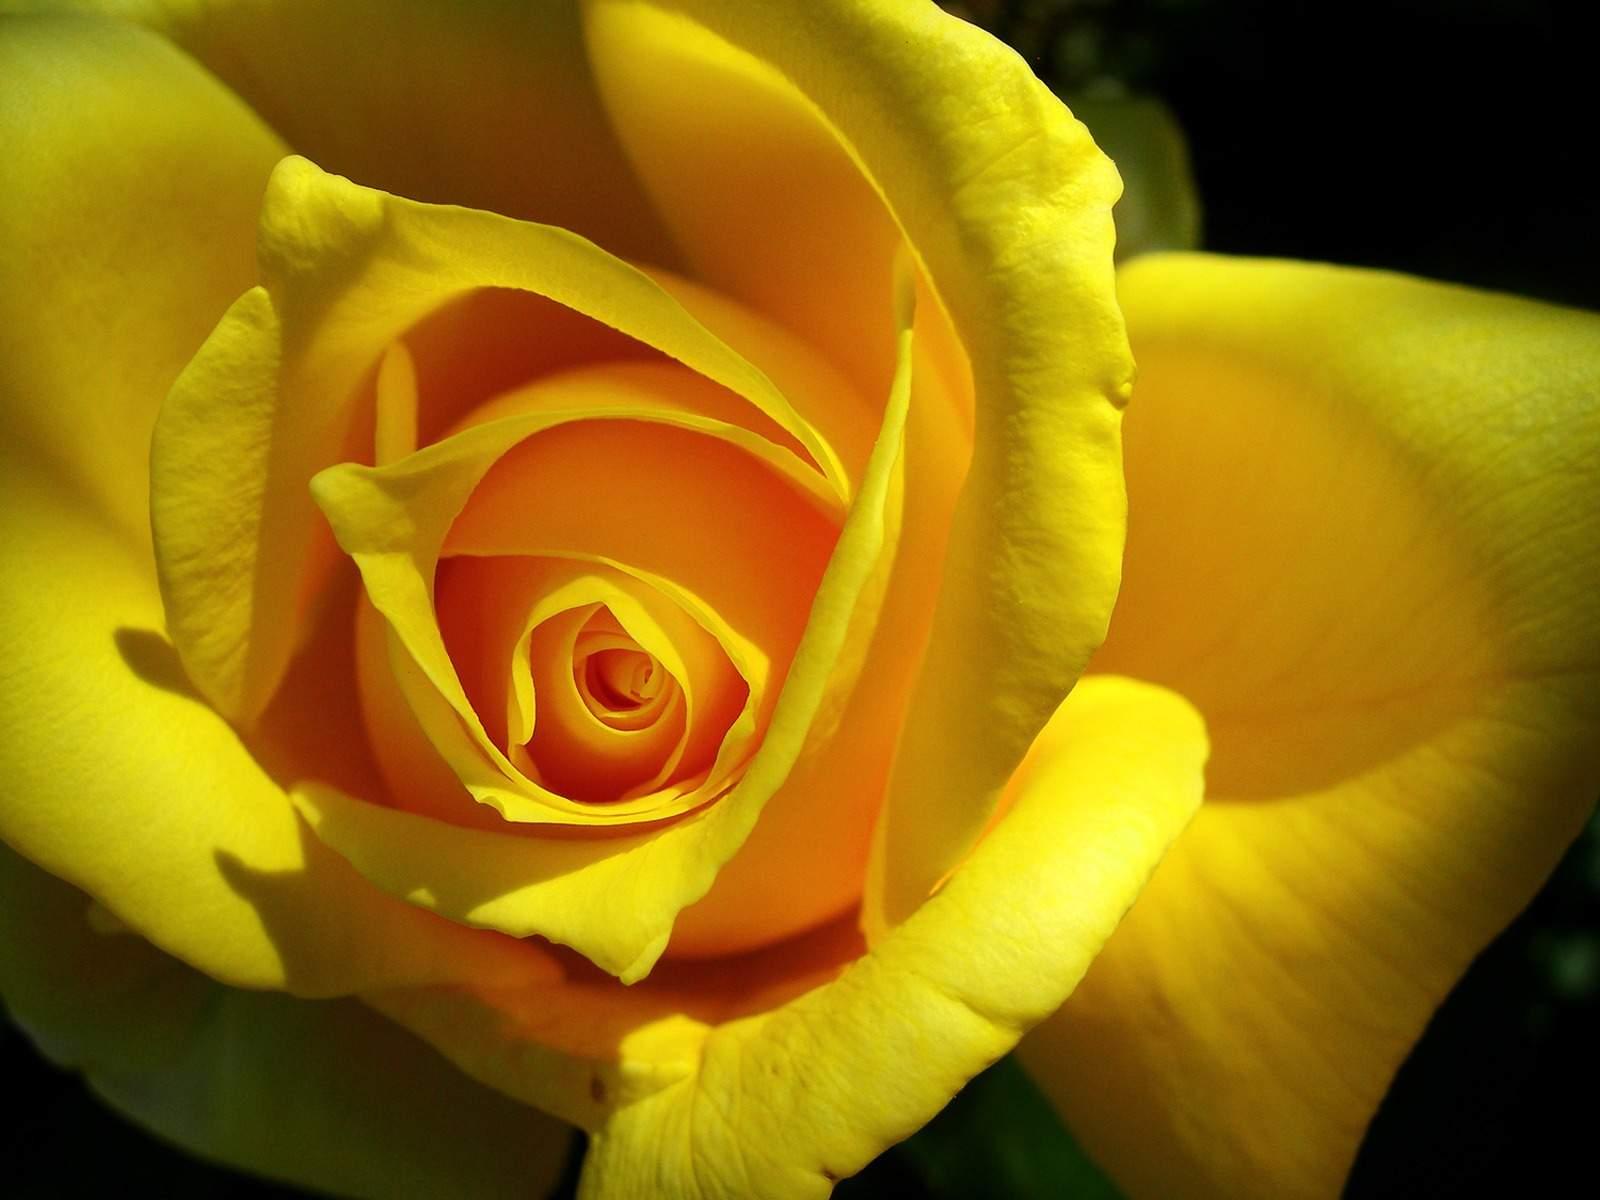 http://2.bp.blogspot.com/-ALbcRZeXnCI/UIQtZ0GcQiI/AAAAAAAAA1c/n6zgivJ2on4/s1600/Yellow-Rose-close-up-hd-yellow-Wallpaper-image-photo.jpg